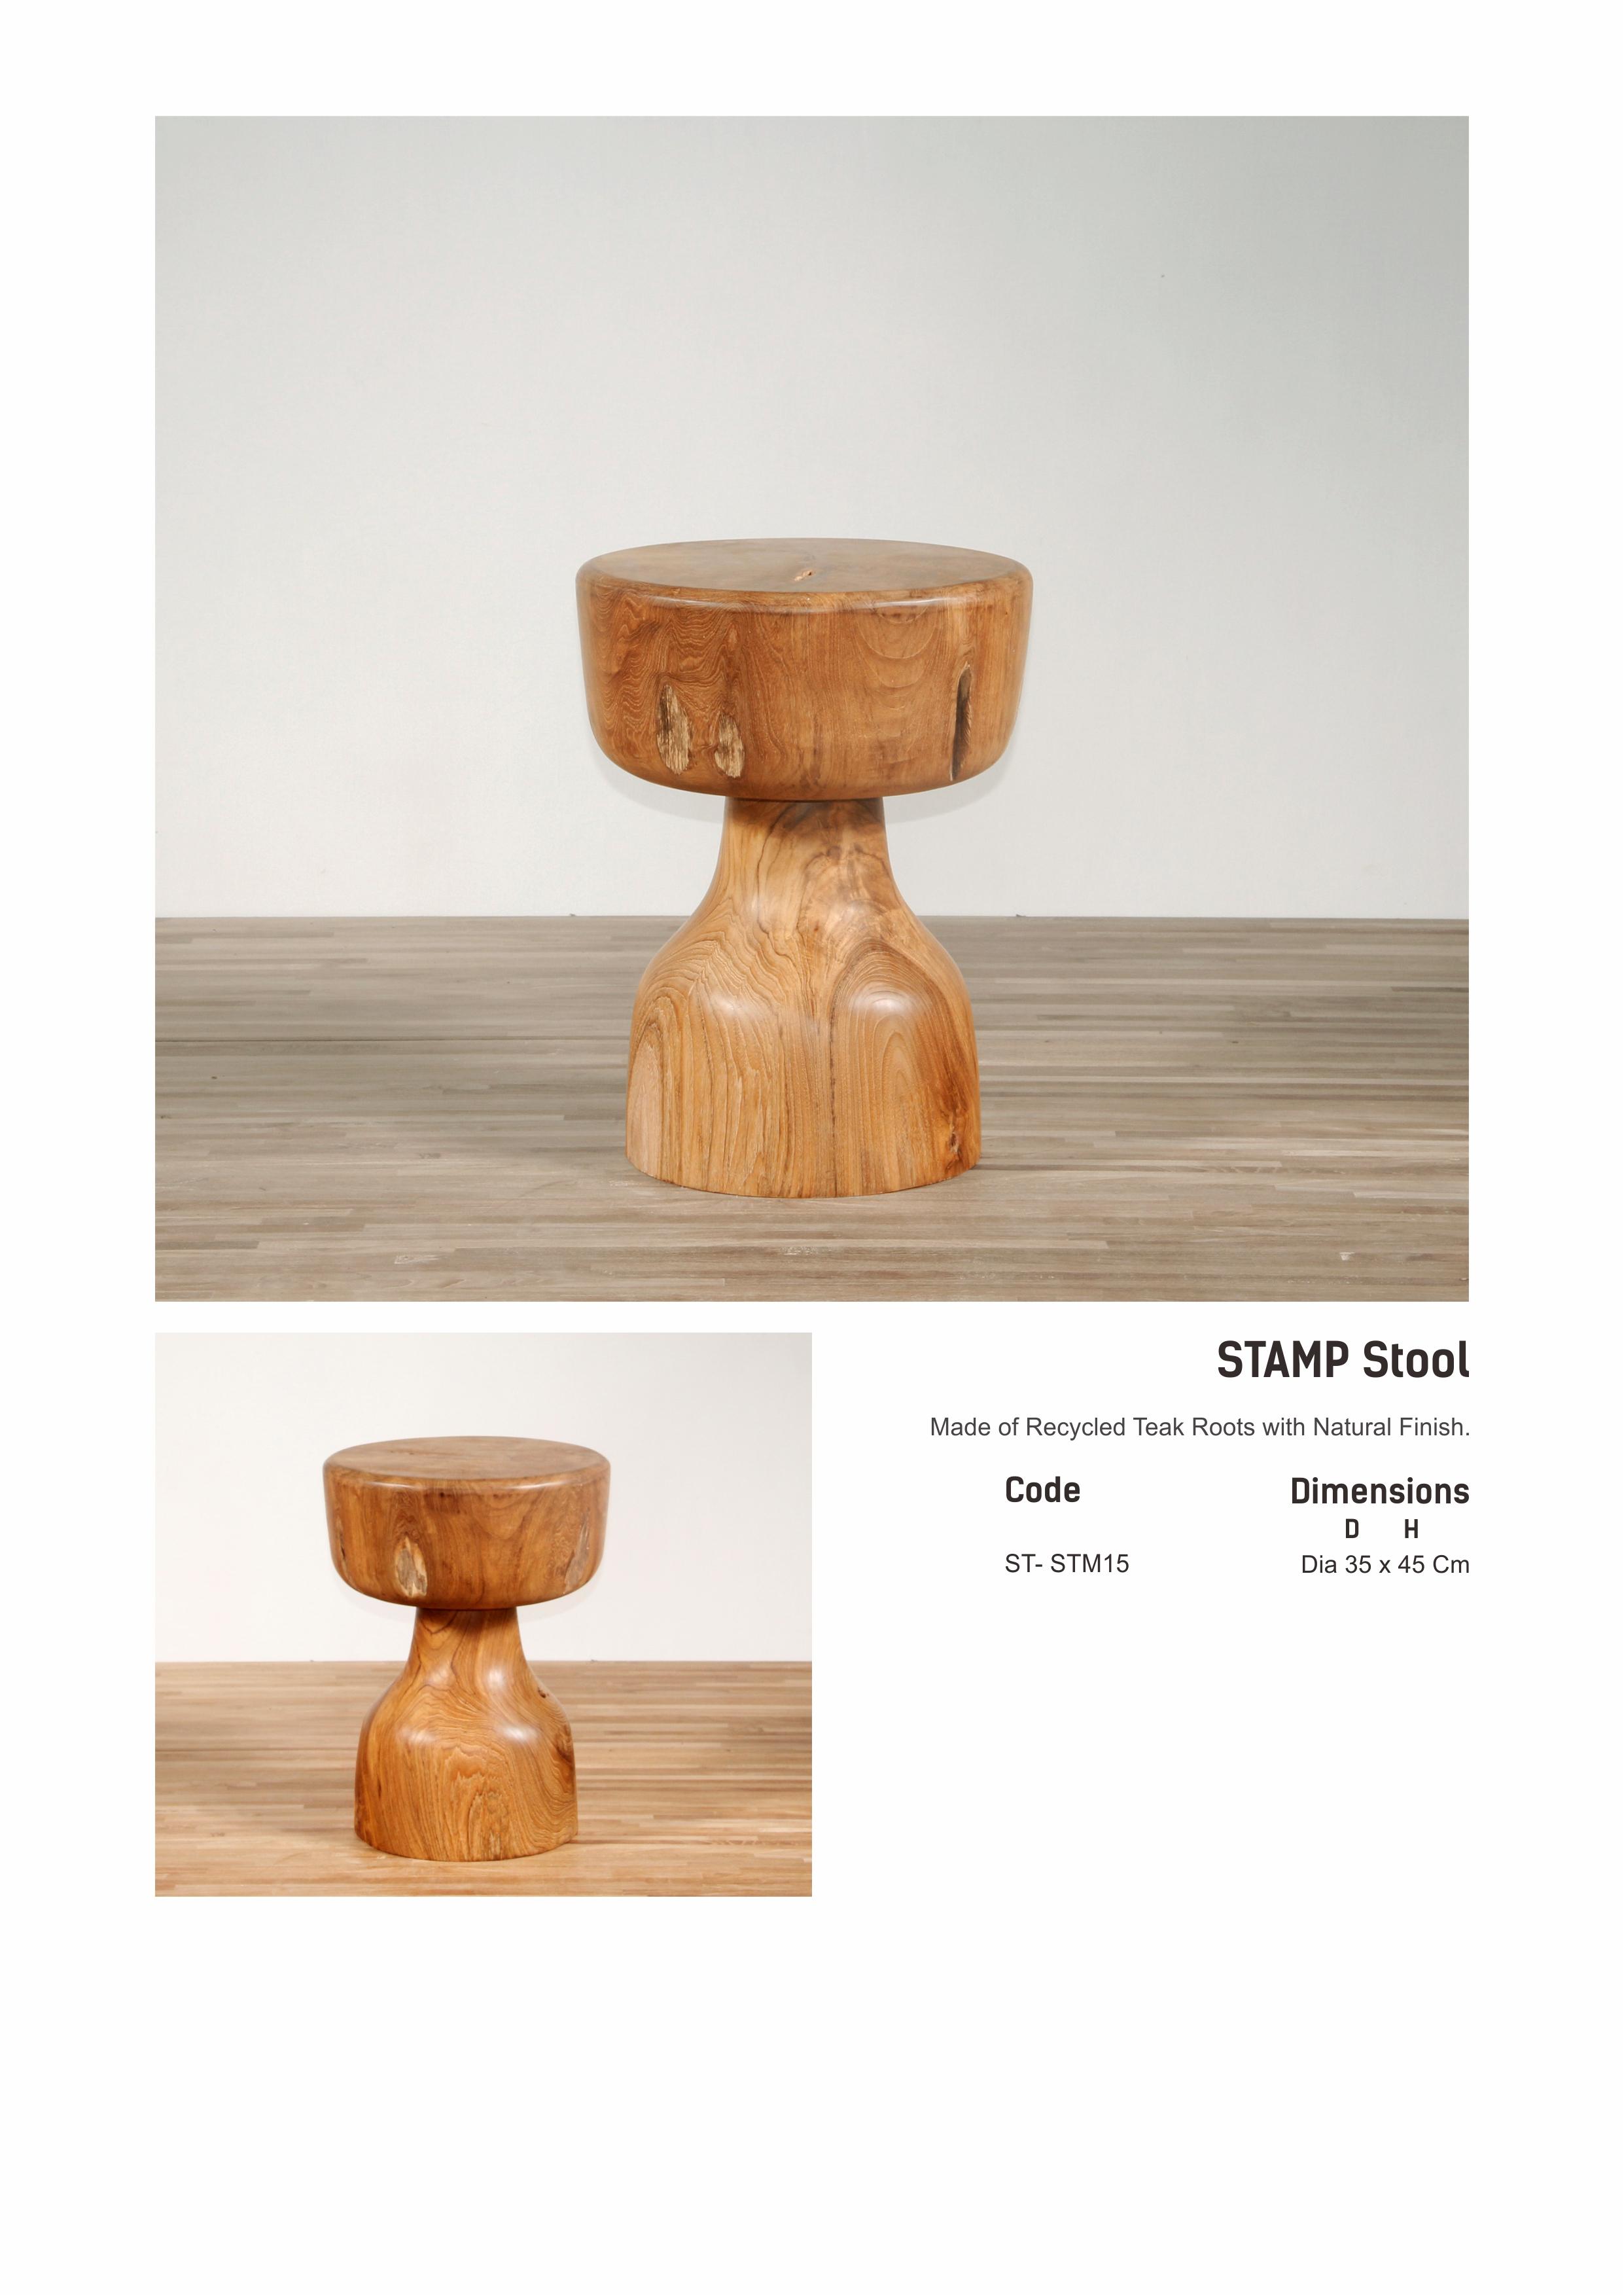 15. STAMP - Stool